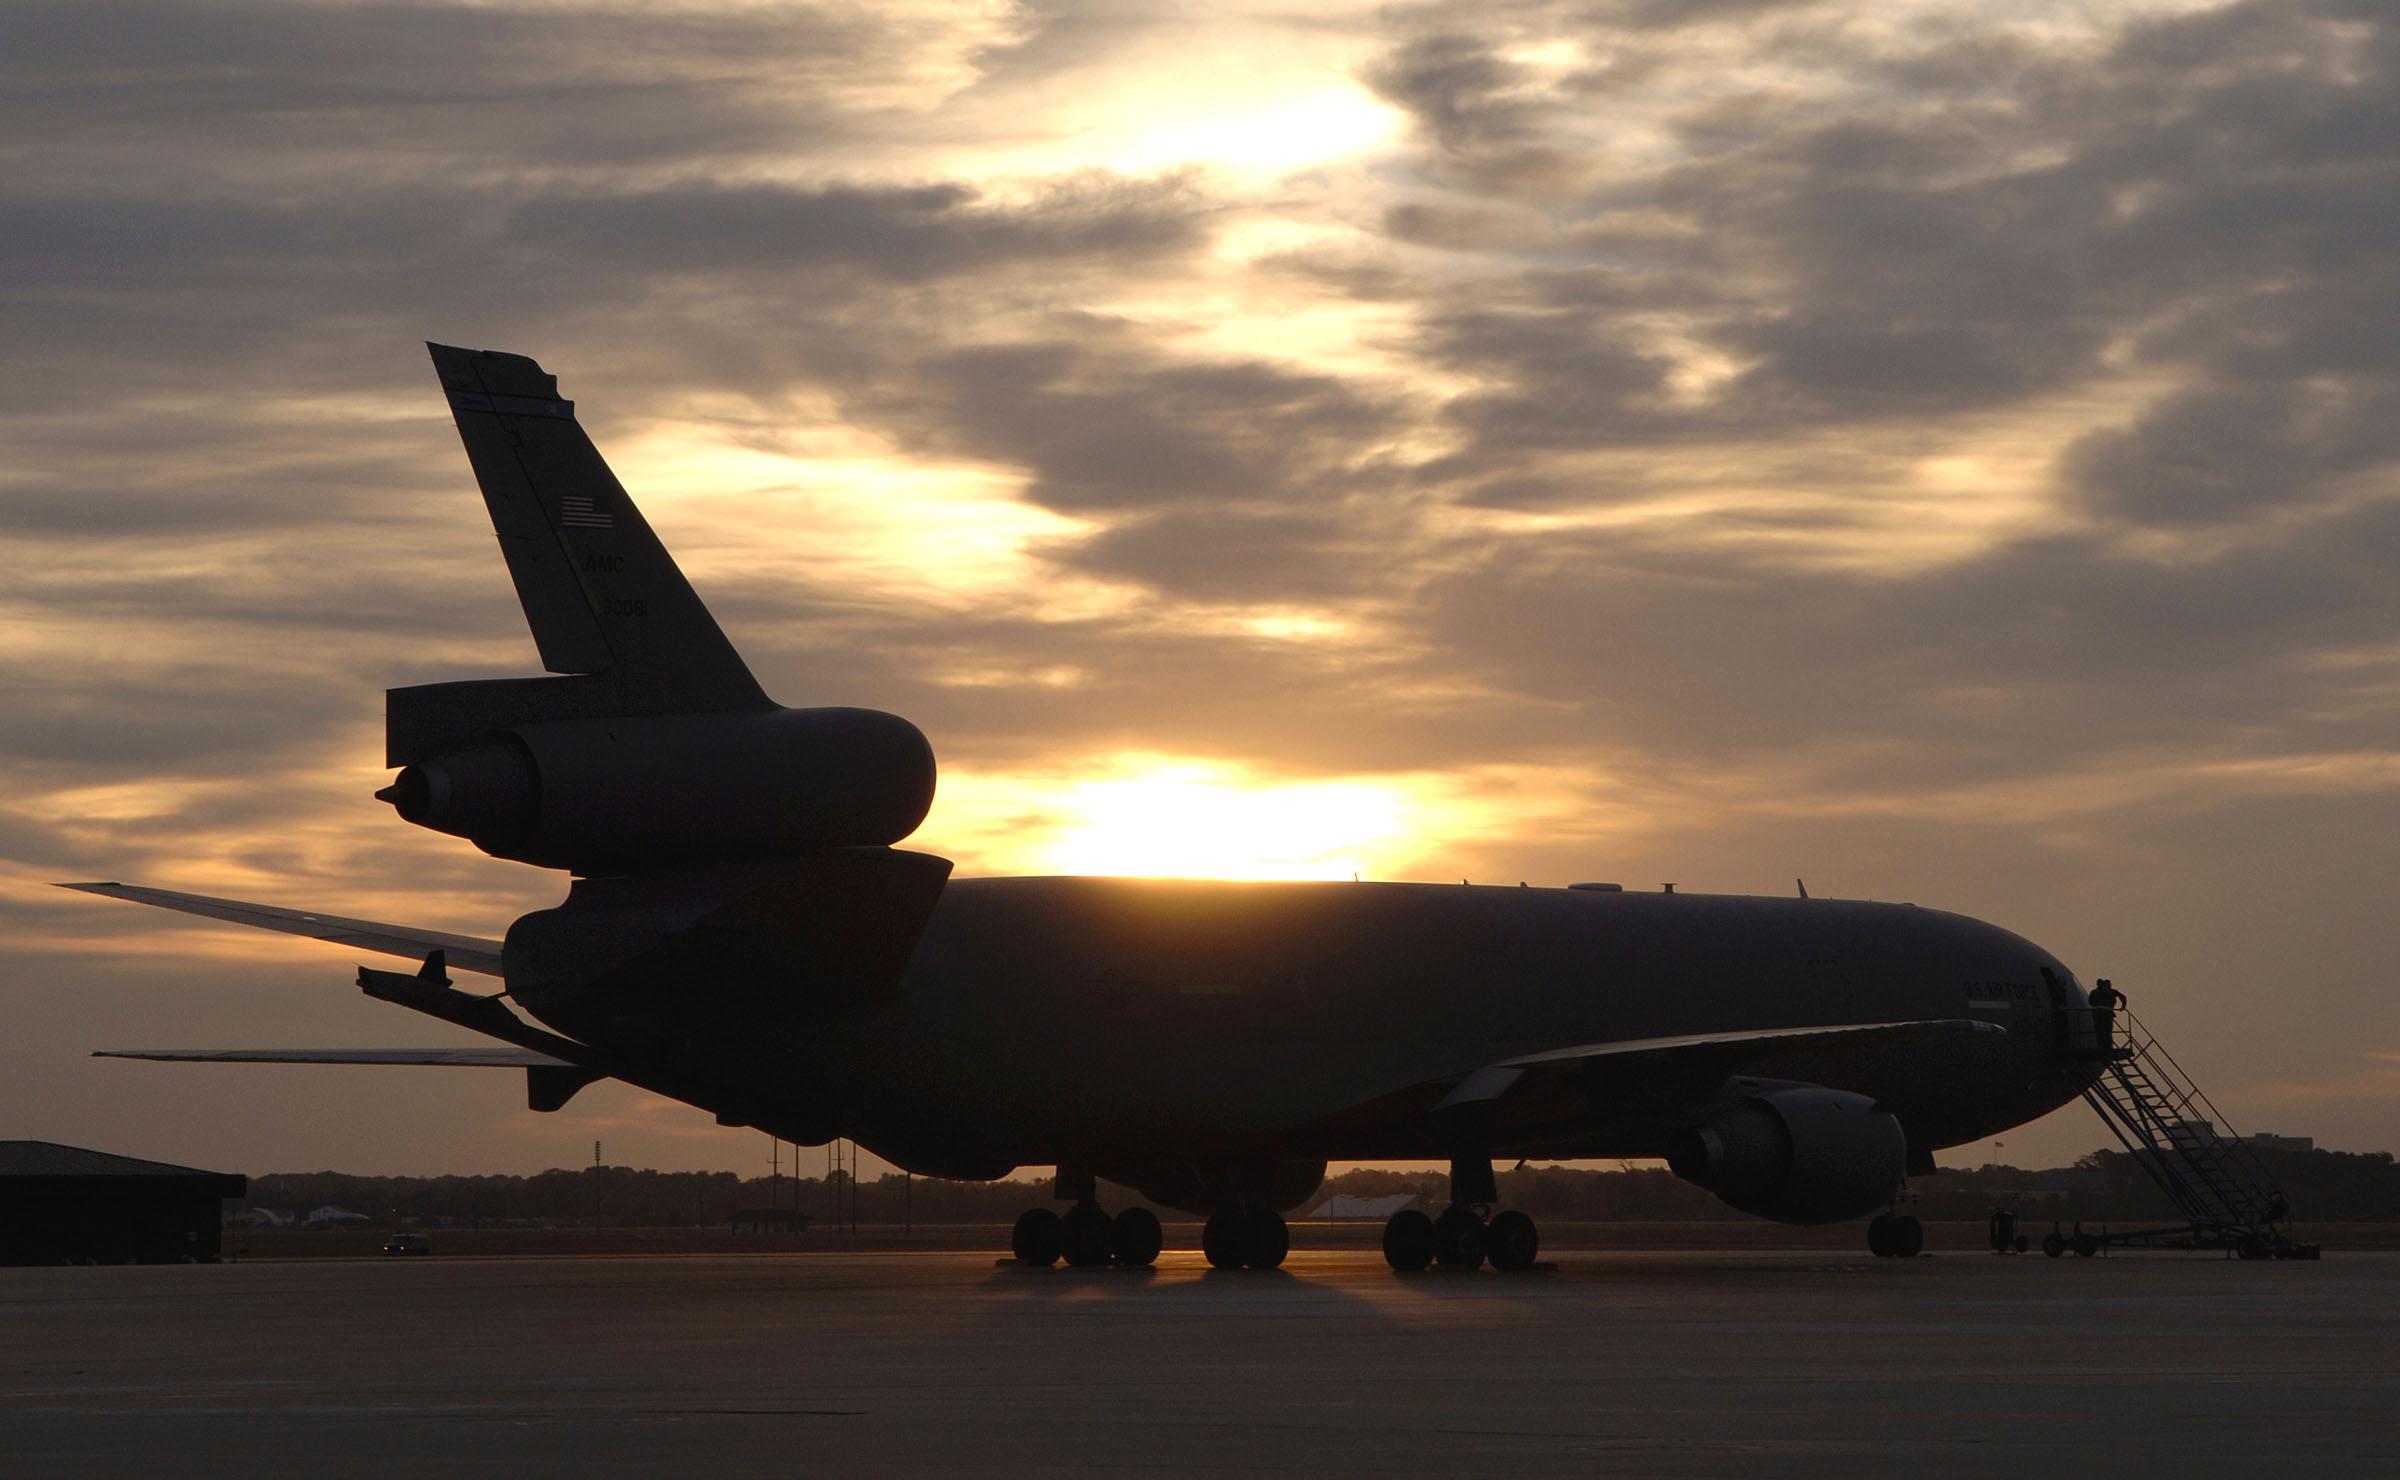 Air Force Height And Weight Chart: KC-10 Extender e U.S. Air Force e Fact Sheet Display,Chart